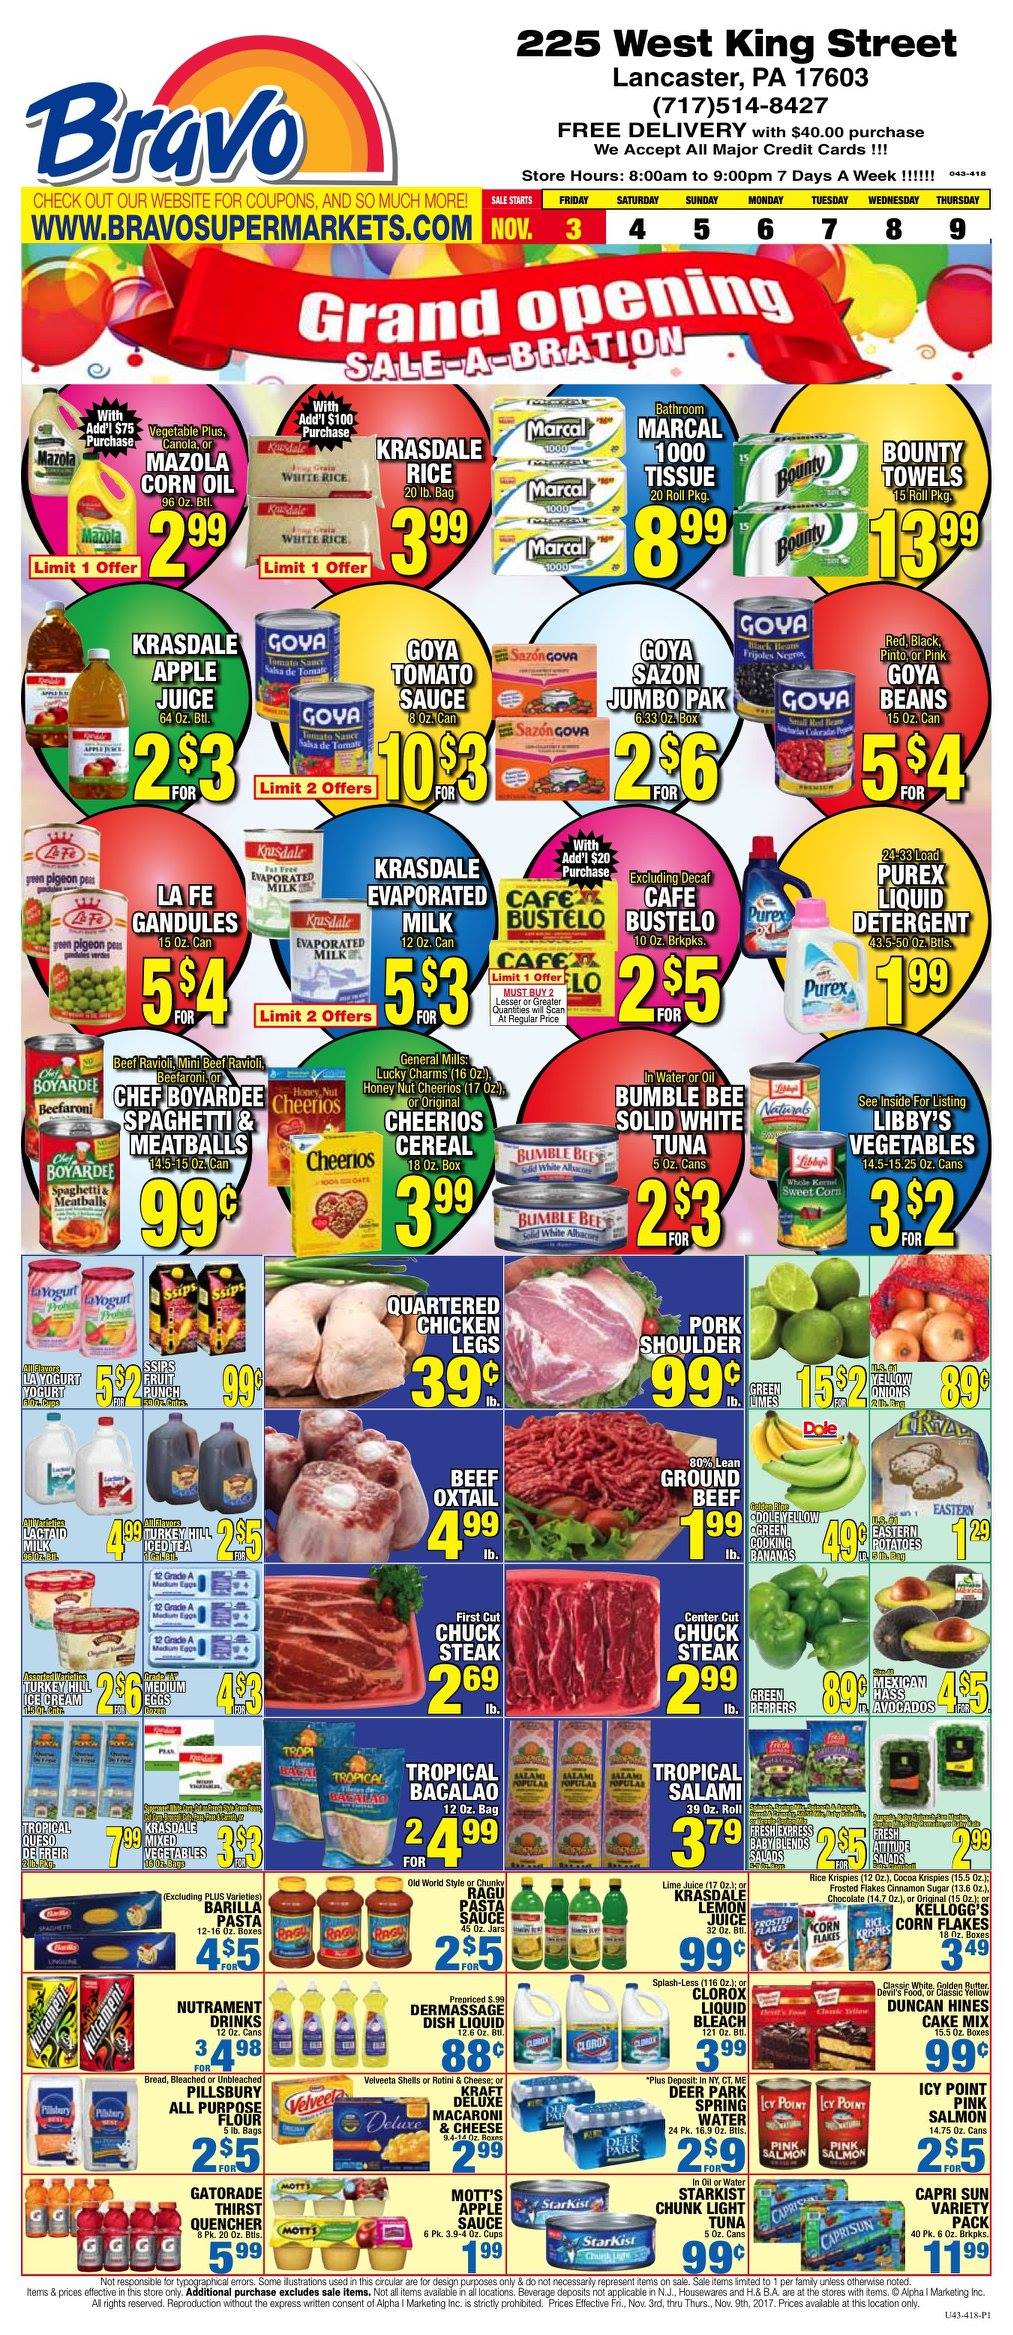 Bravo Supermarket 225 W King St, Lancaster